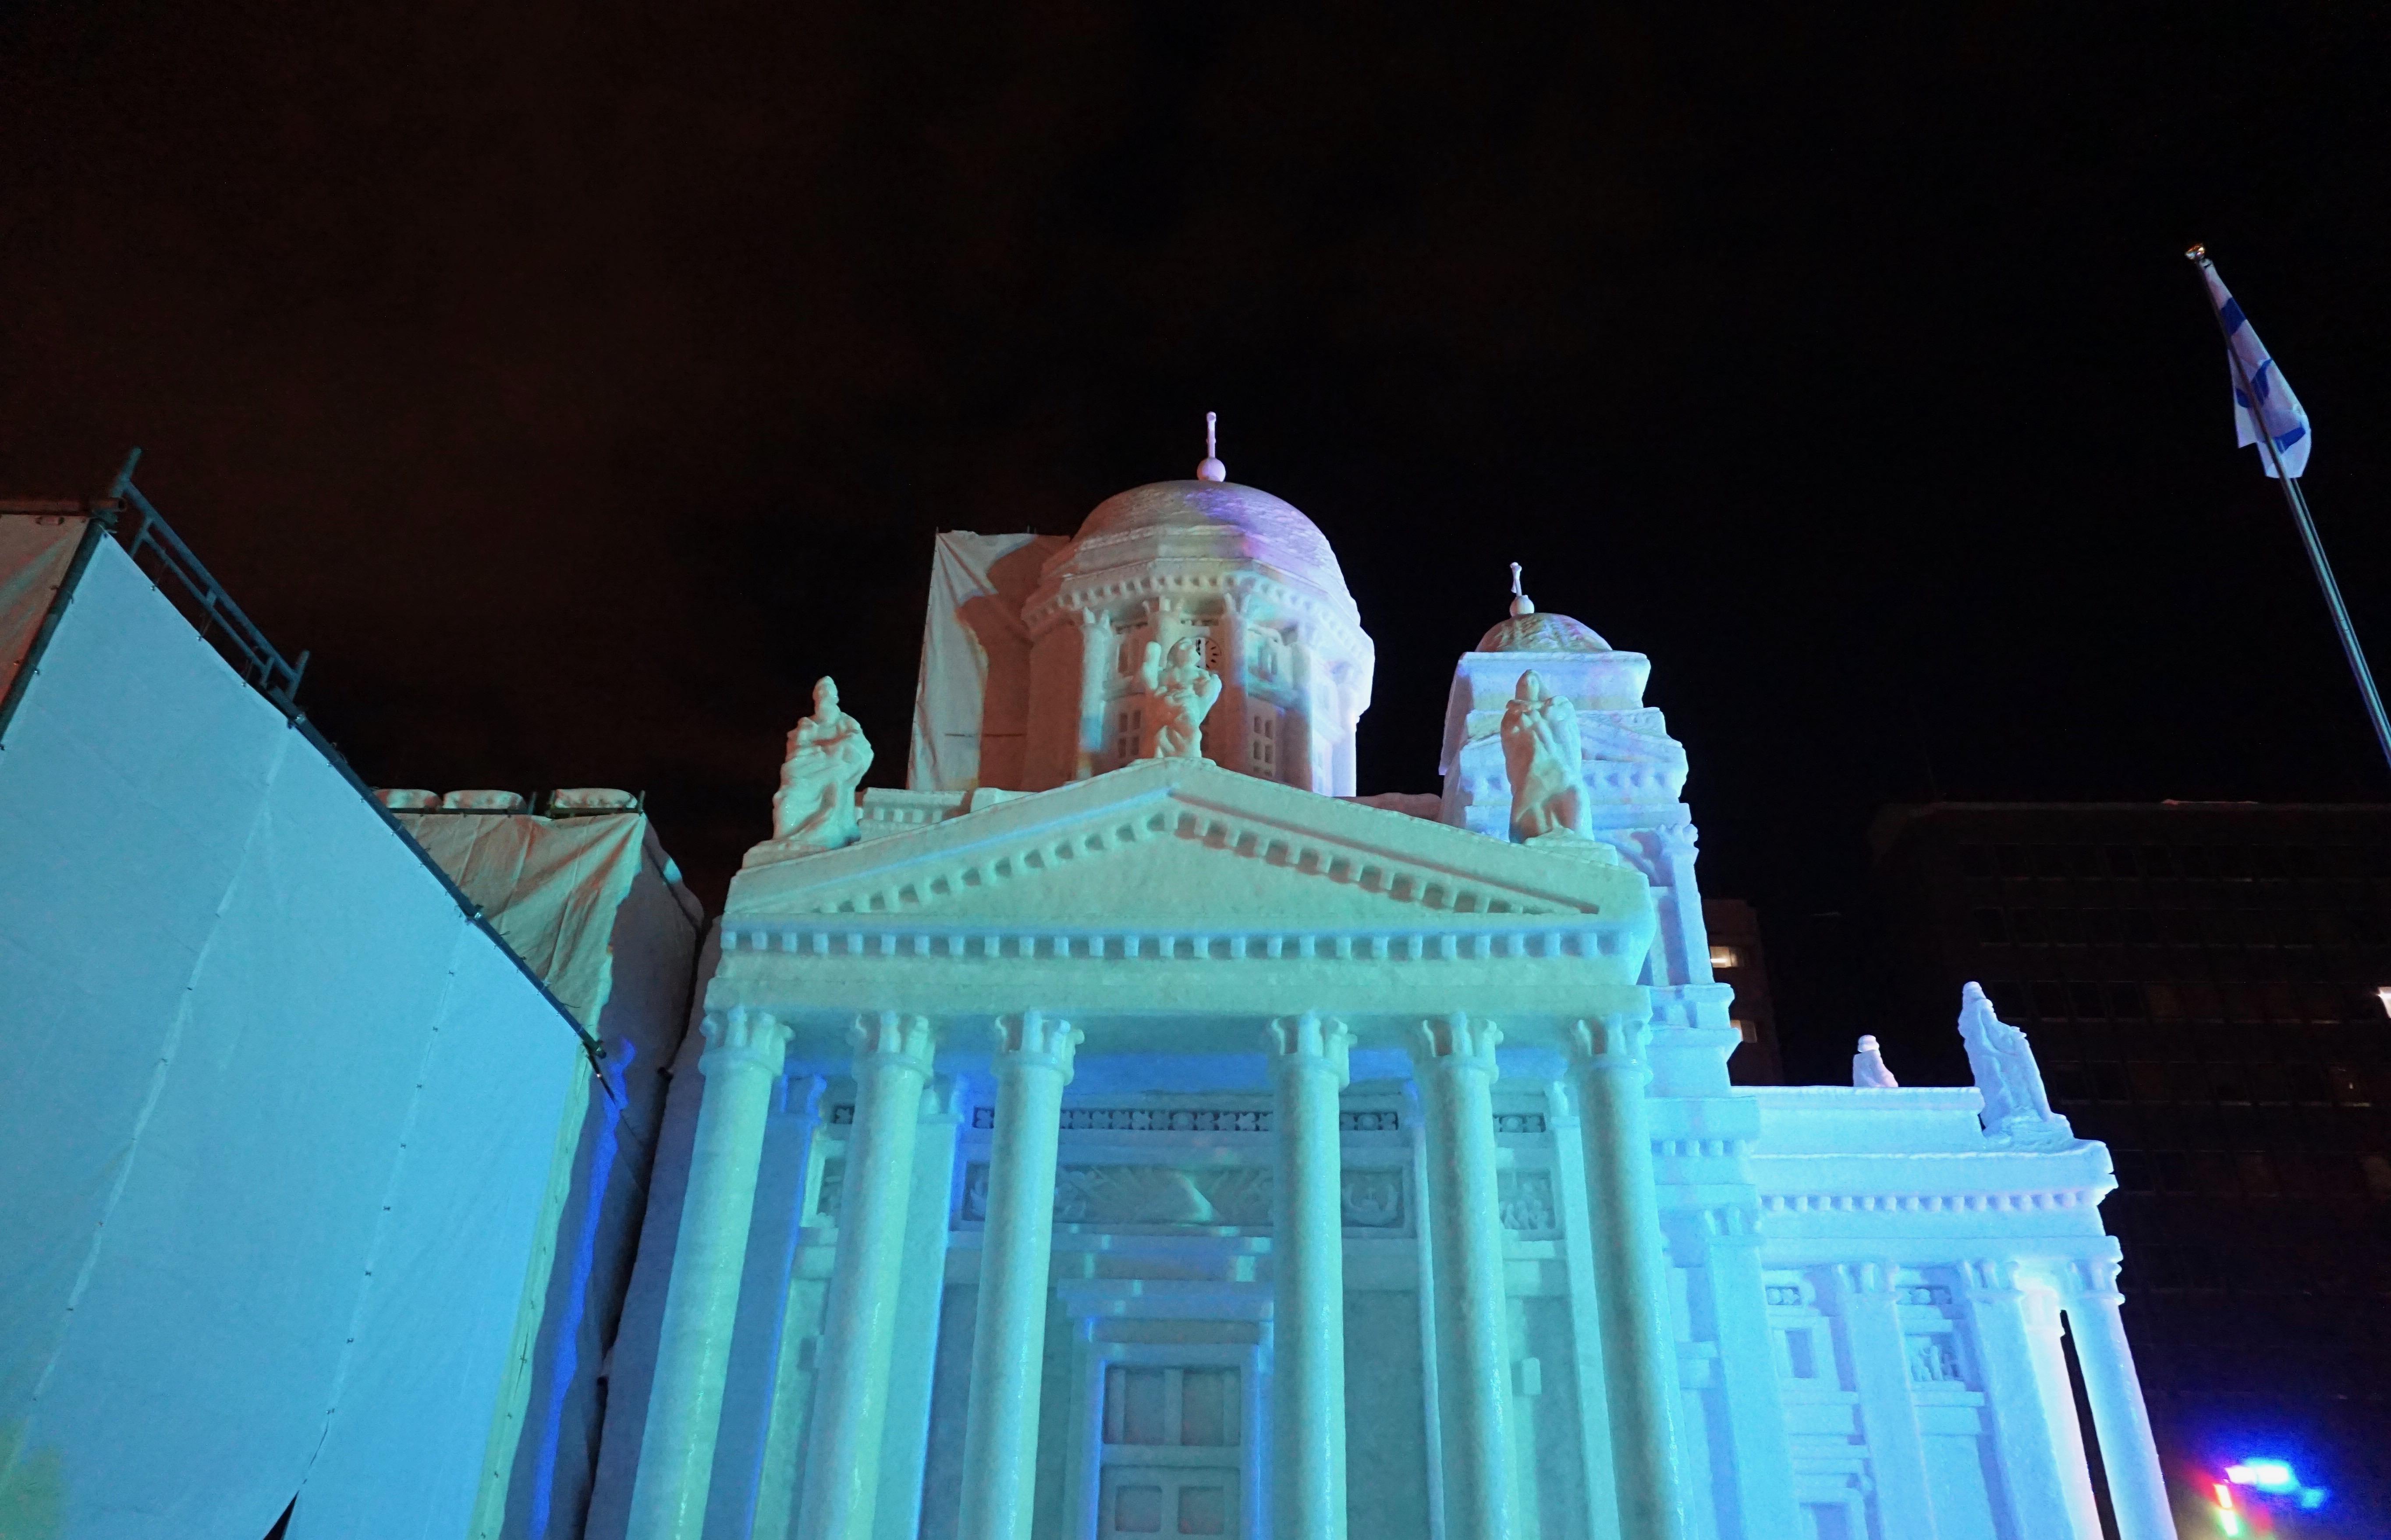 Helsinki cathedral detail